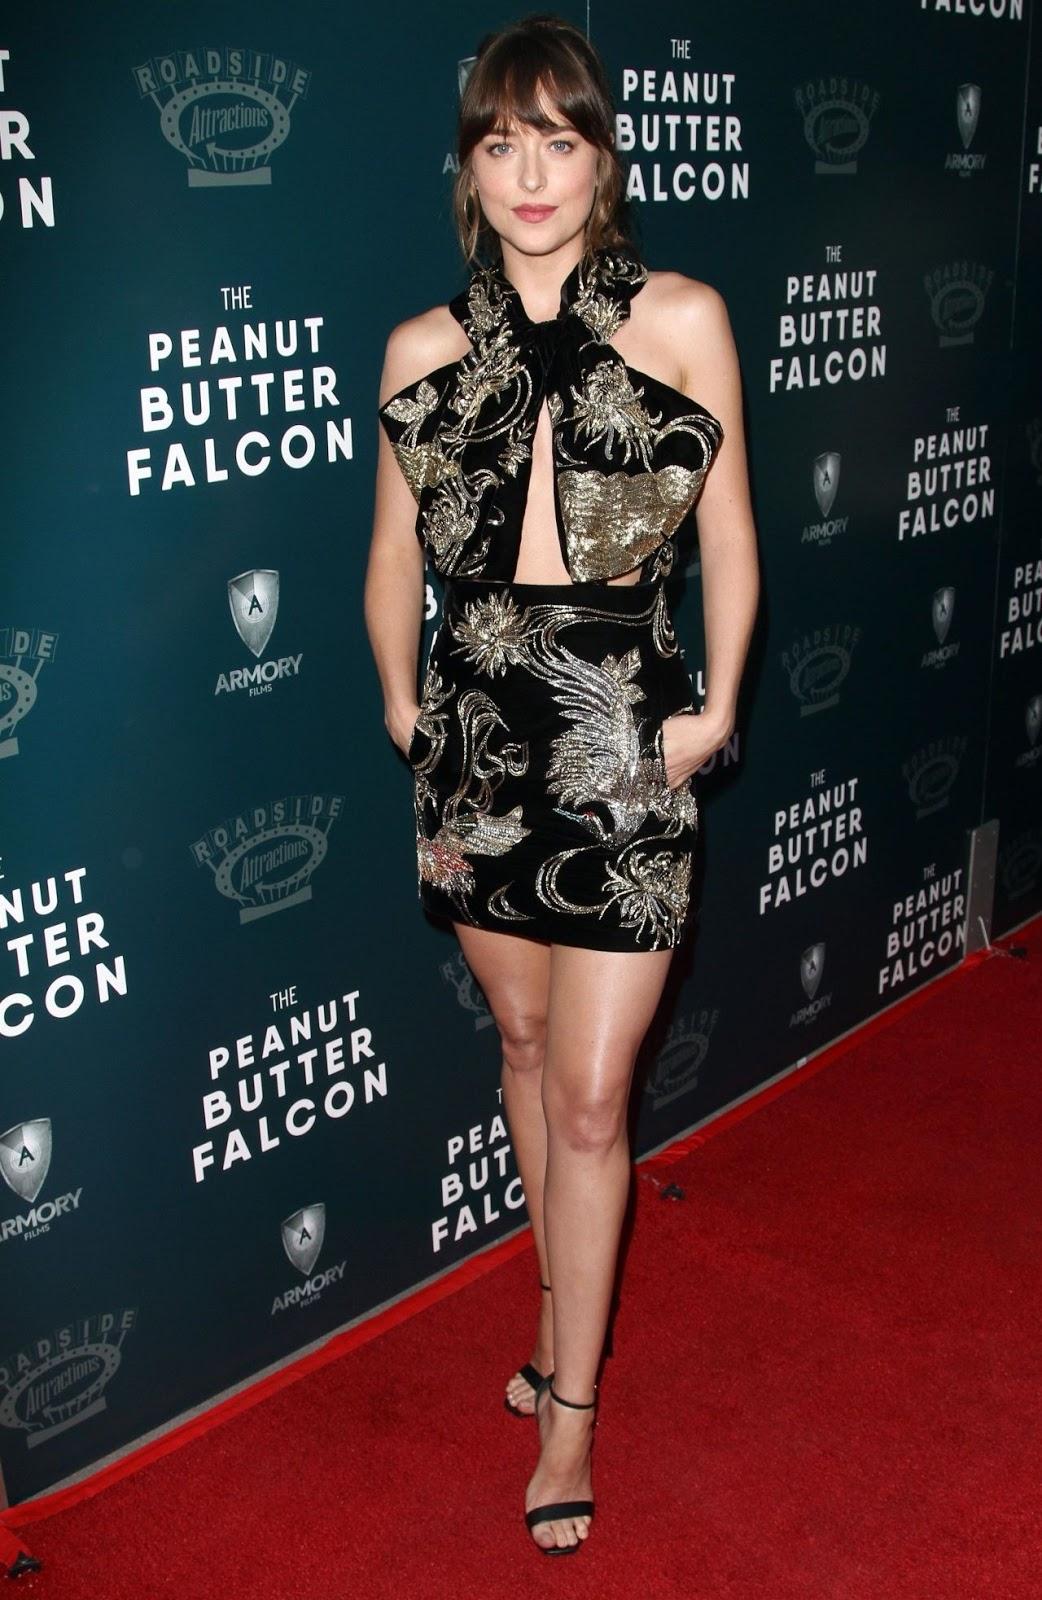 Dakota Johnson dazzles in black embroidered mini-dress for The Peanut Butter Falcon screening in Los Angeles